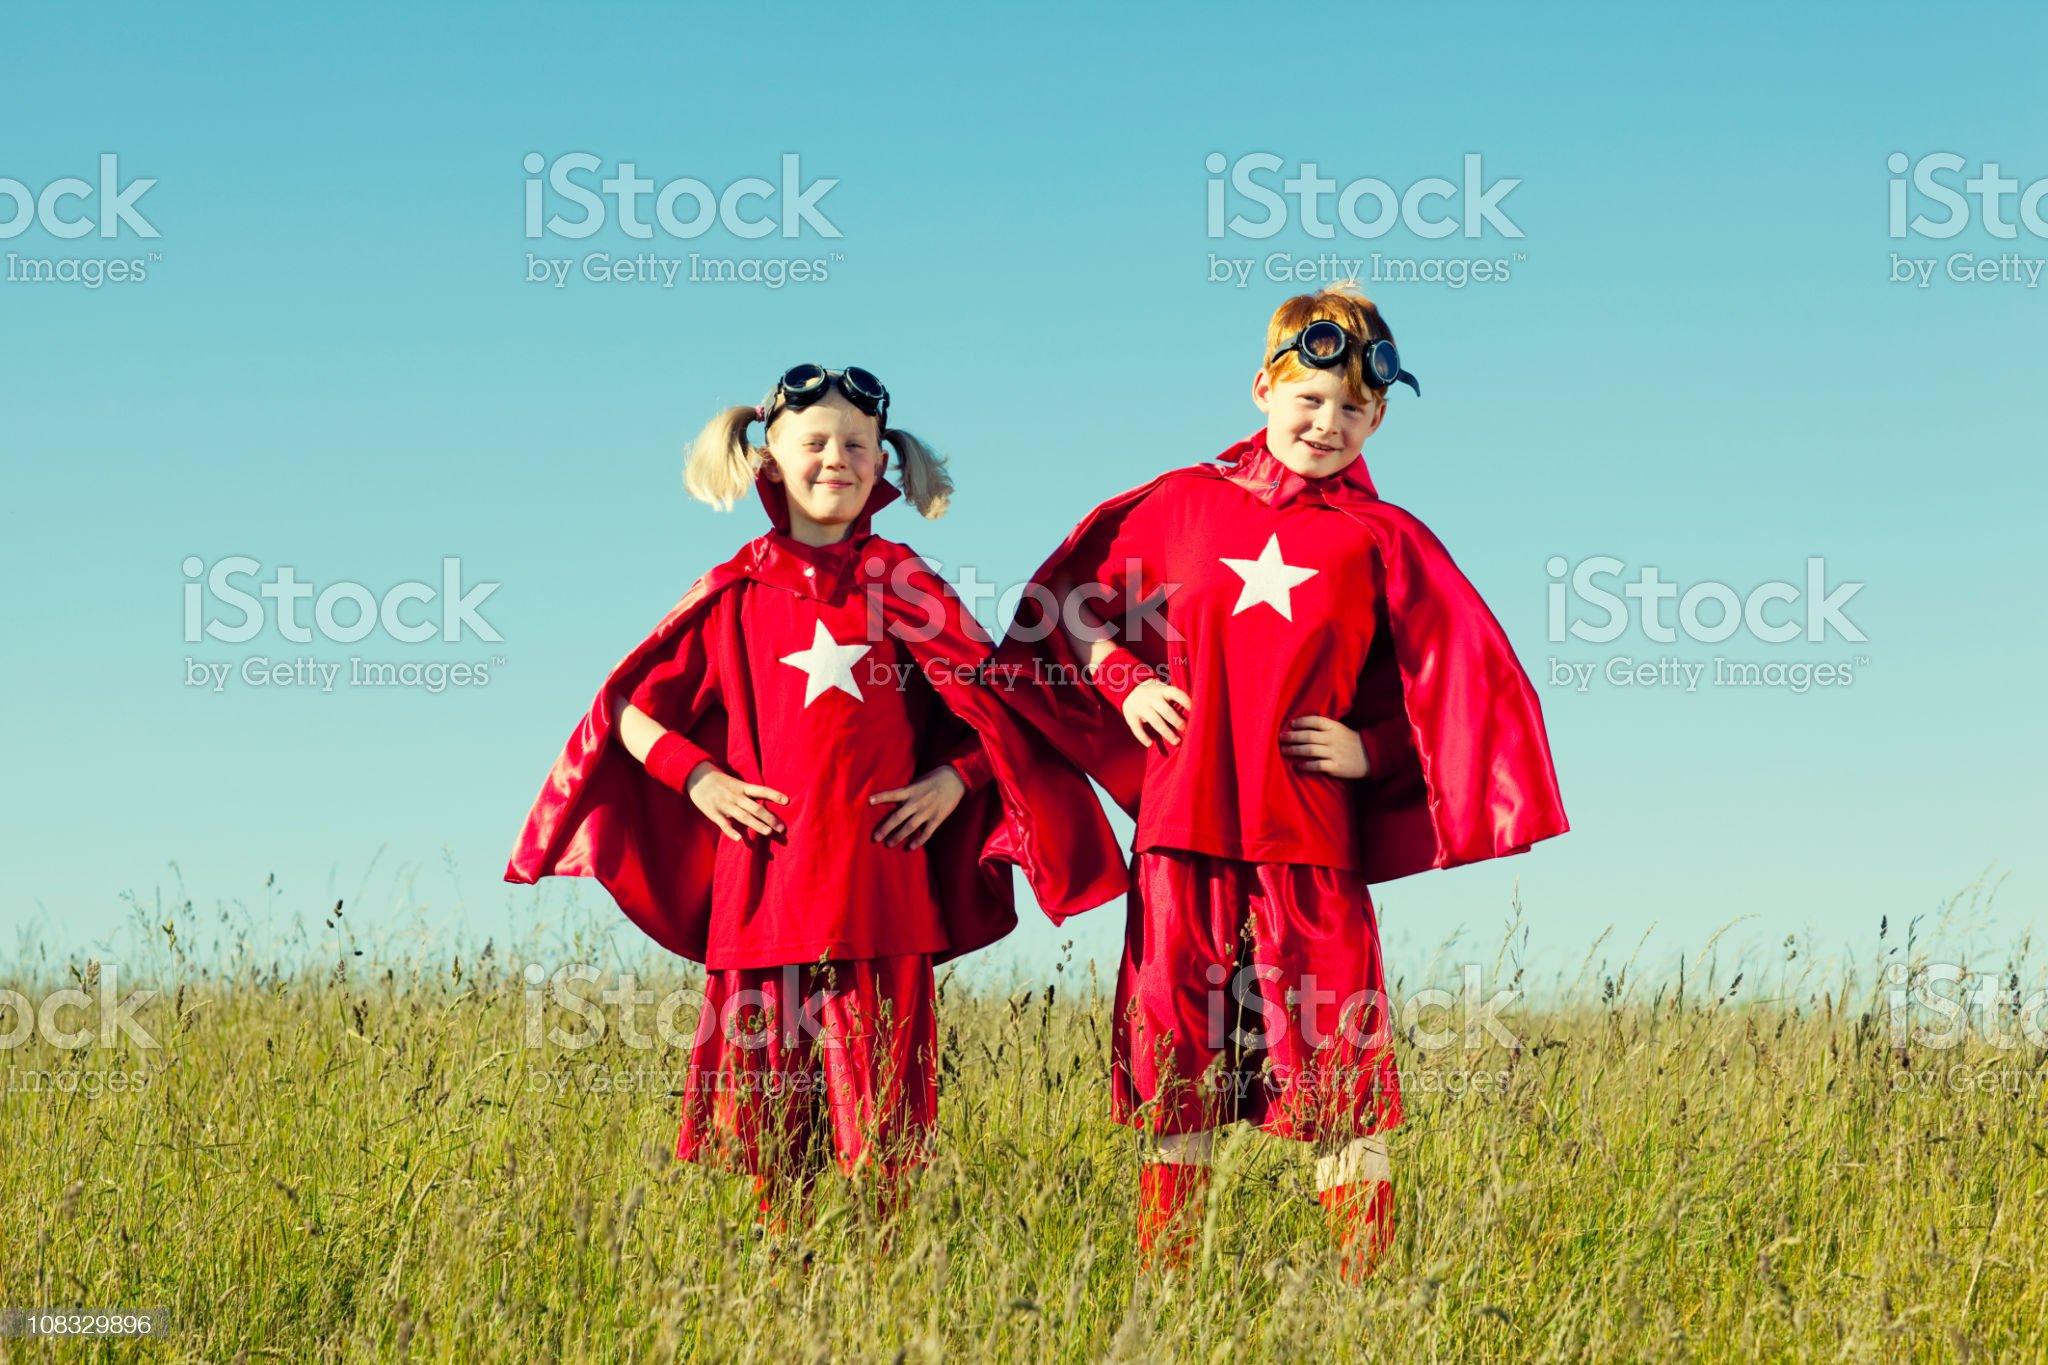 Superhero Duo royalty-free stock photo